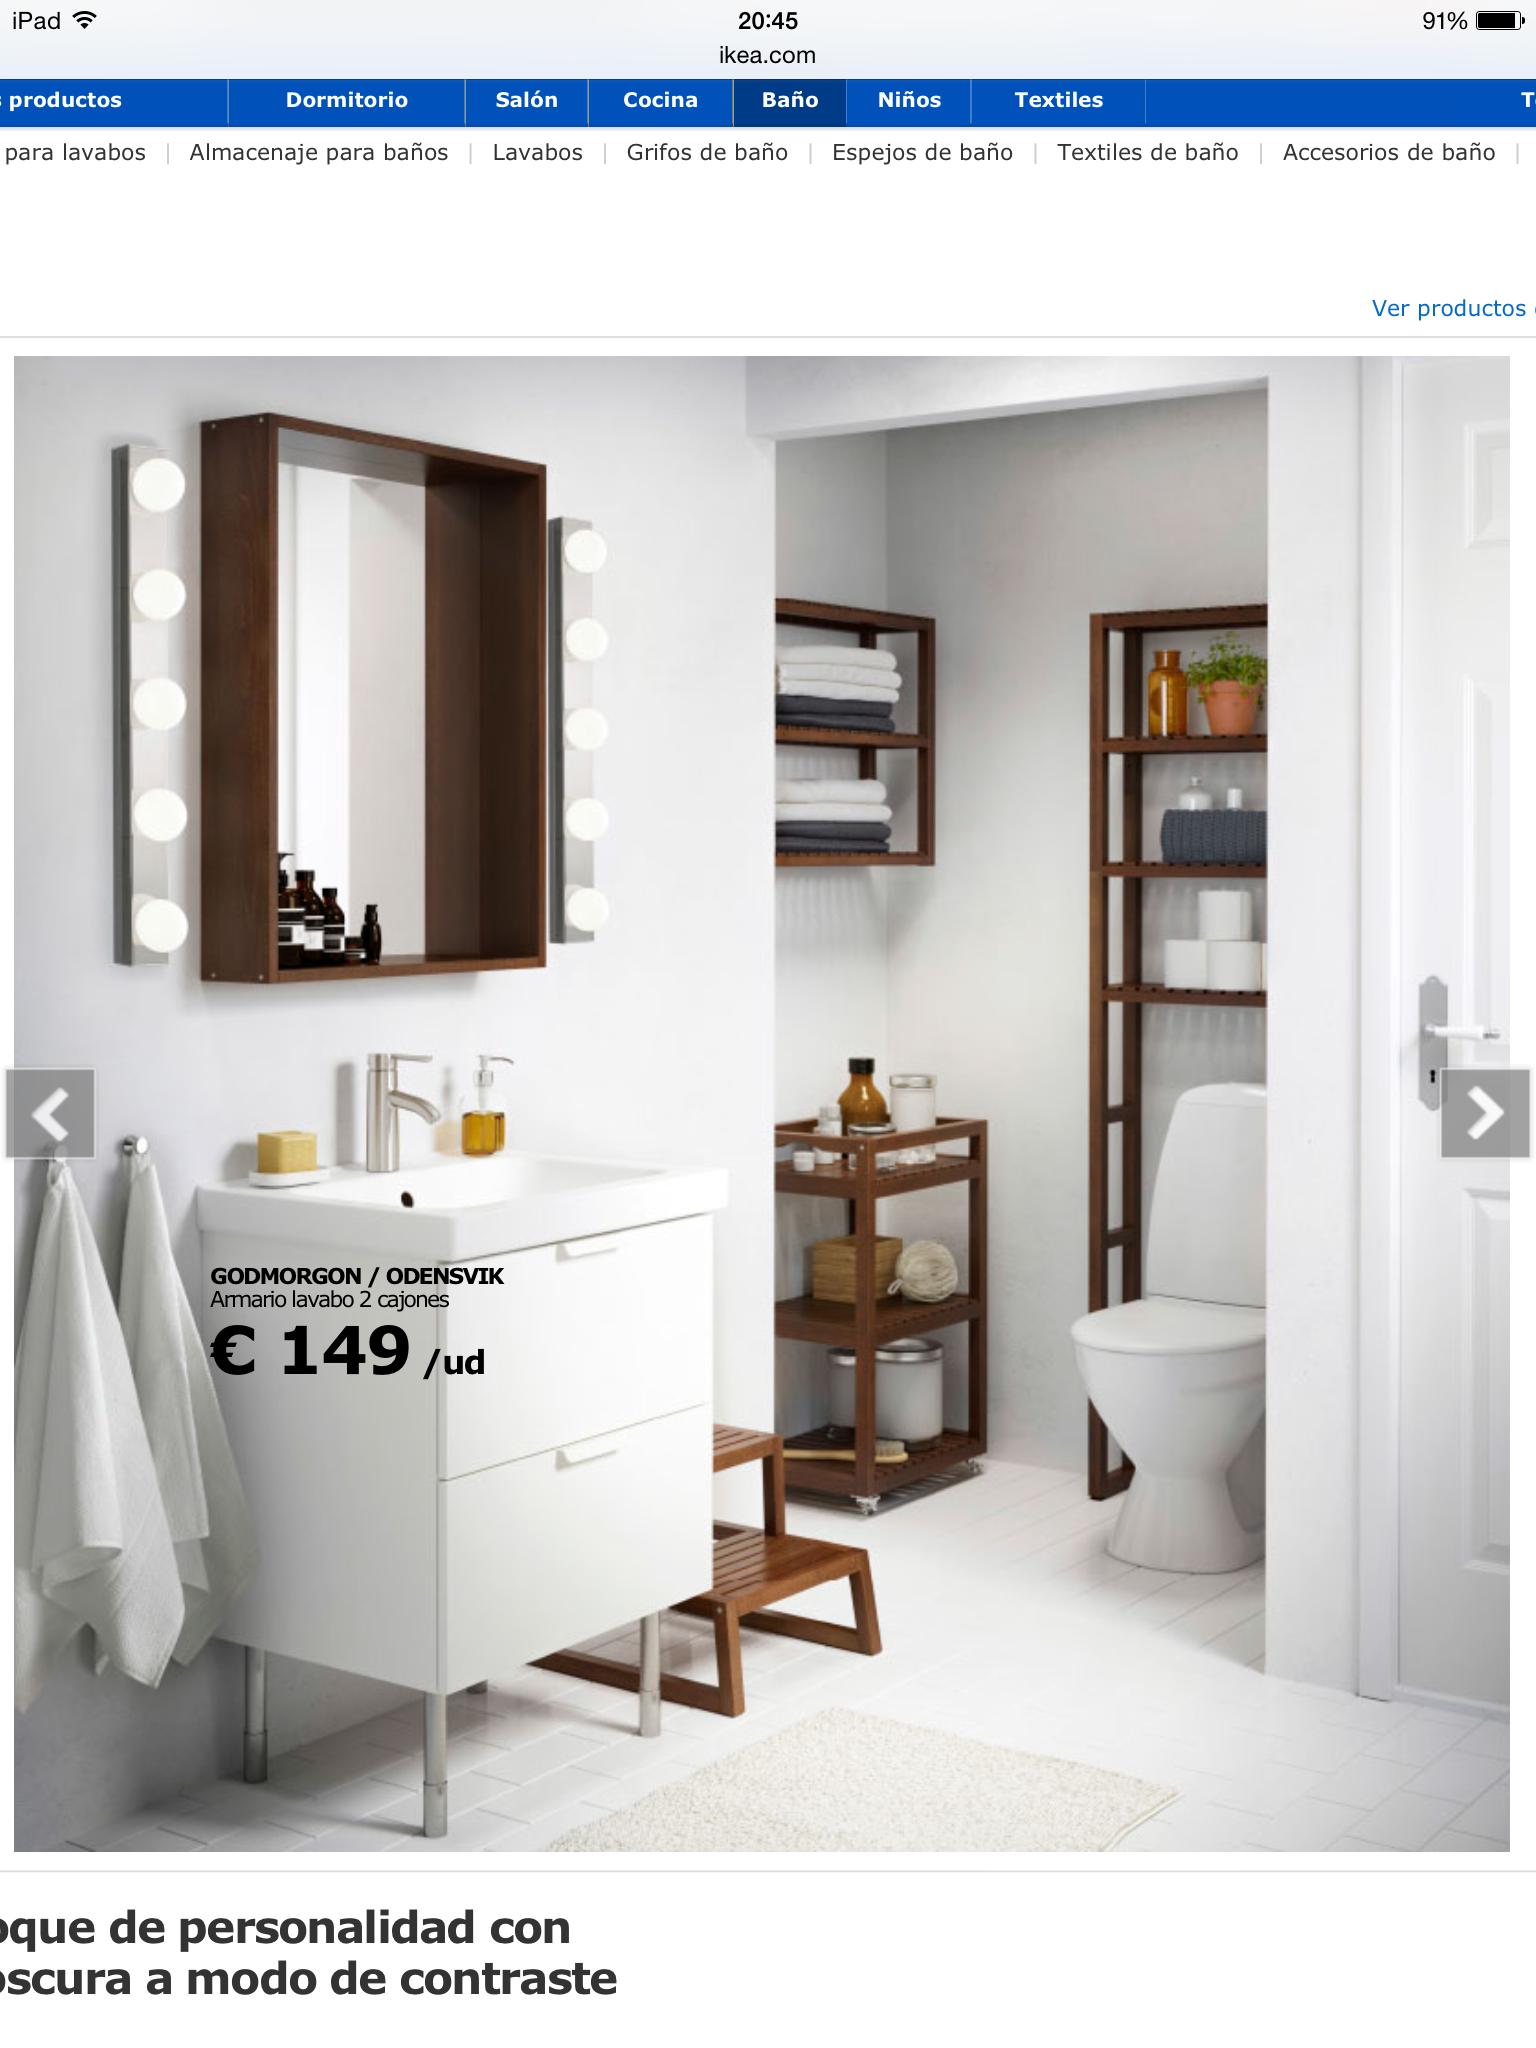 Explore Ikea Bathroom Bathroom Ideas And More